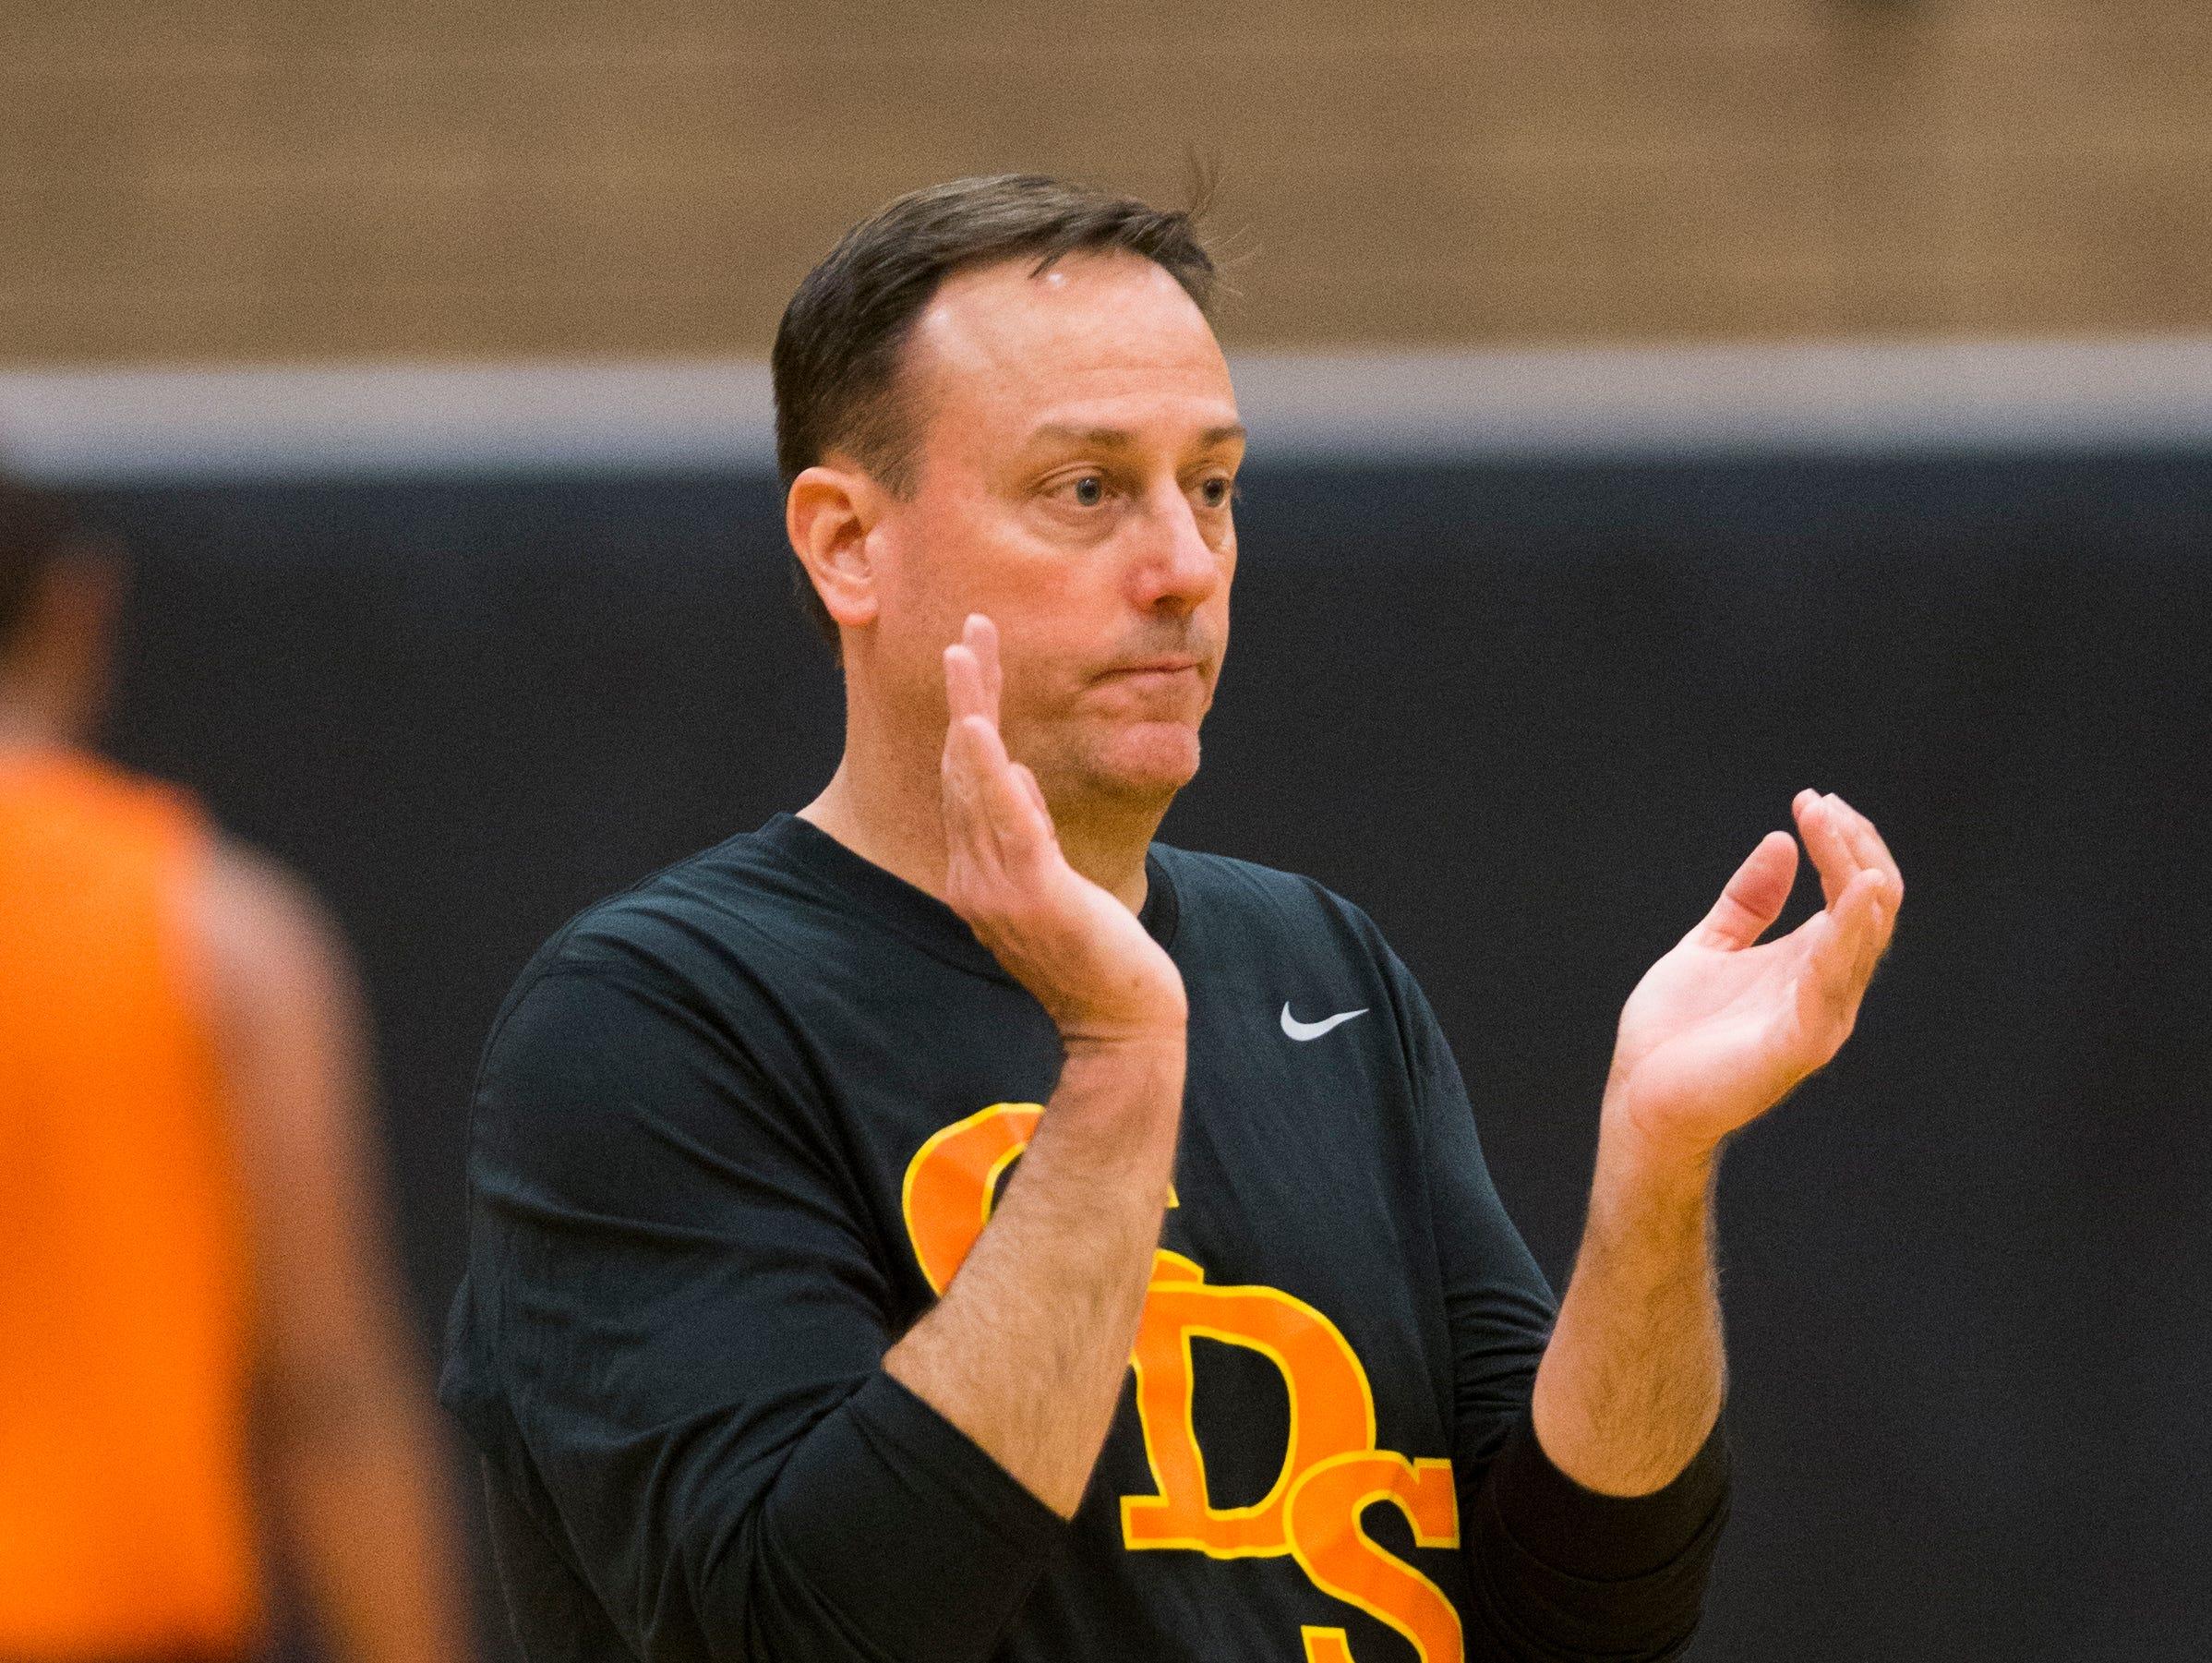 Corona del Sol basketball coach Sam Duane Jr. claps while his team practice in Tempe November 17, 2014.